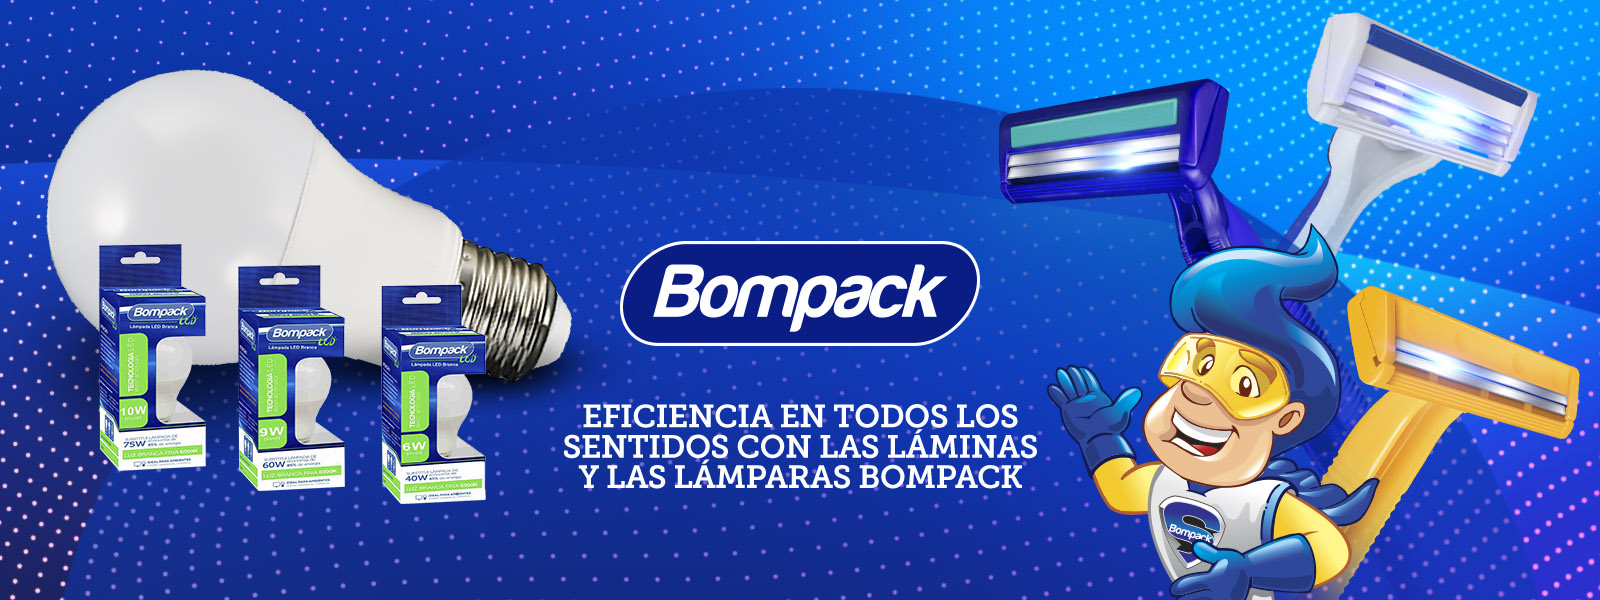 ref_c_Embrast_Banner_Site_espanhol_BANNER4_1600x600px